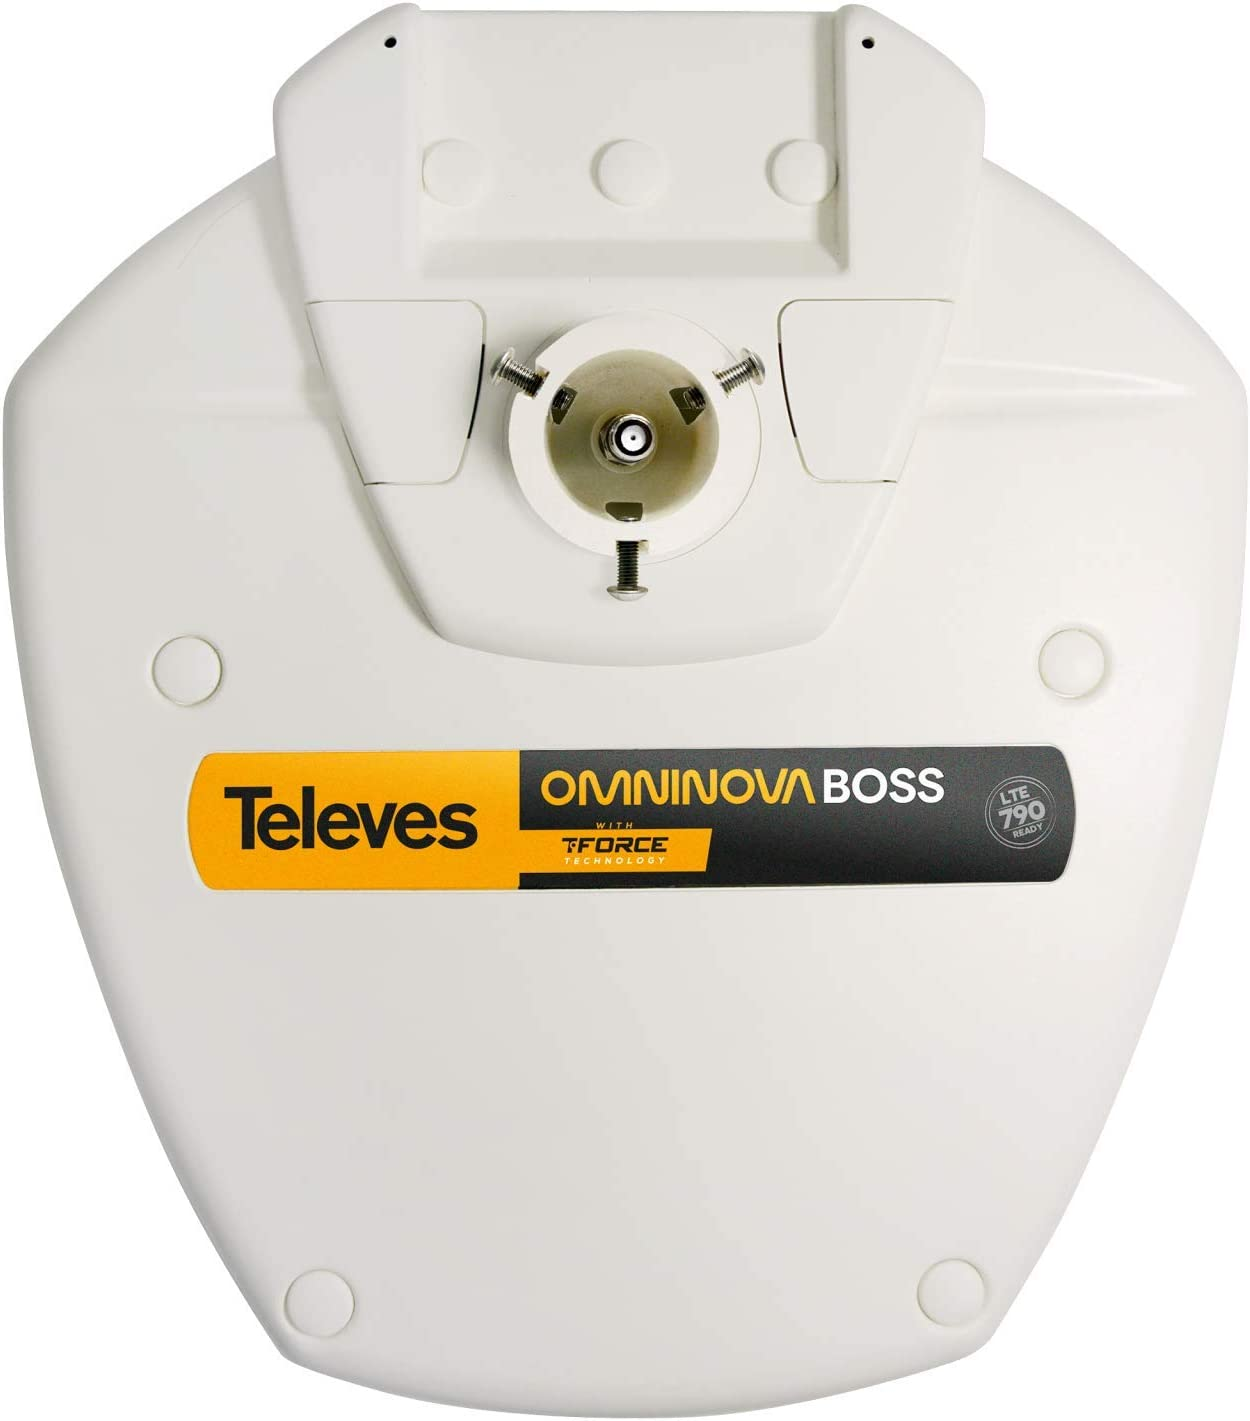 Antena Televes Omninova Boss Modelo 144442